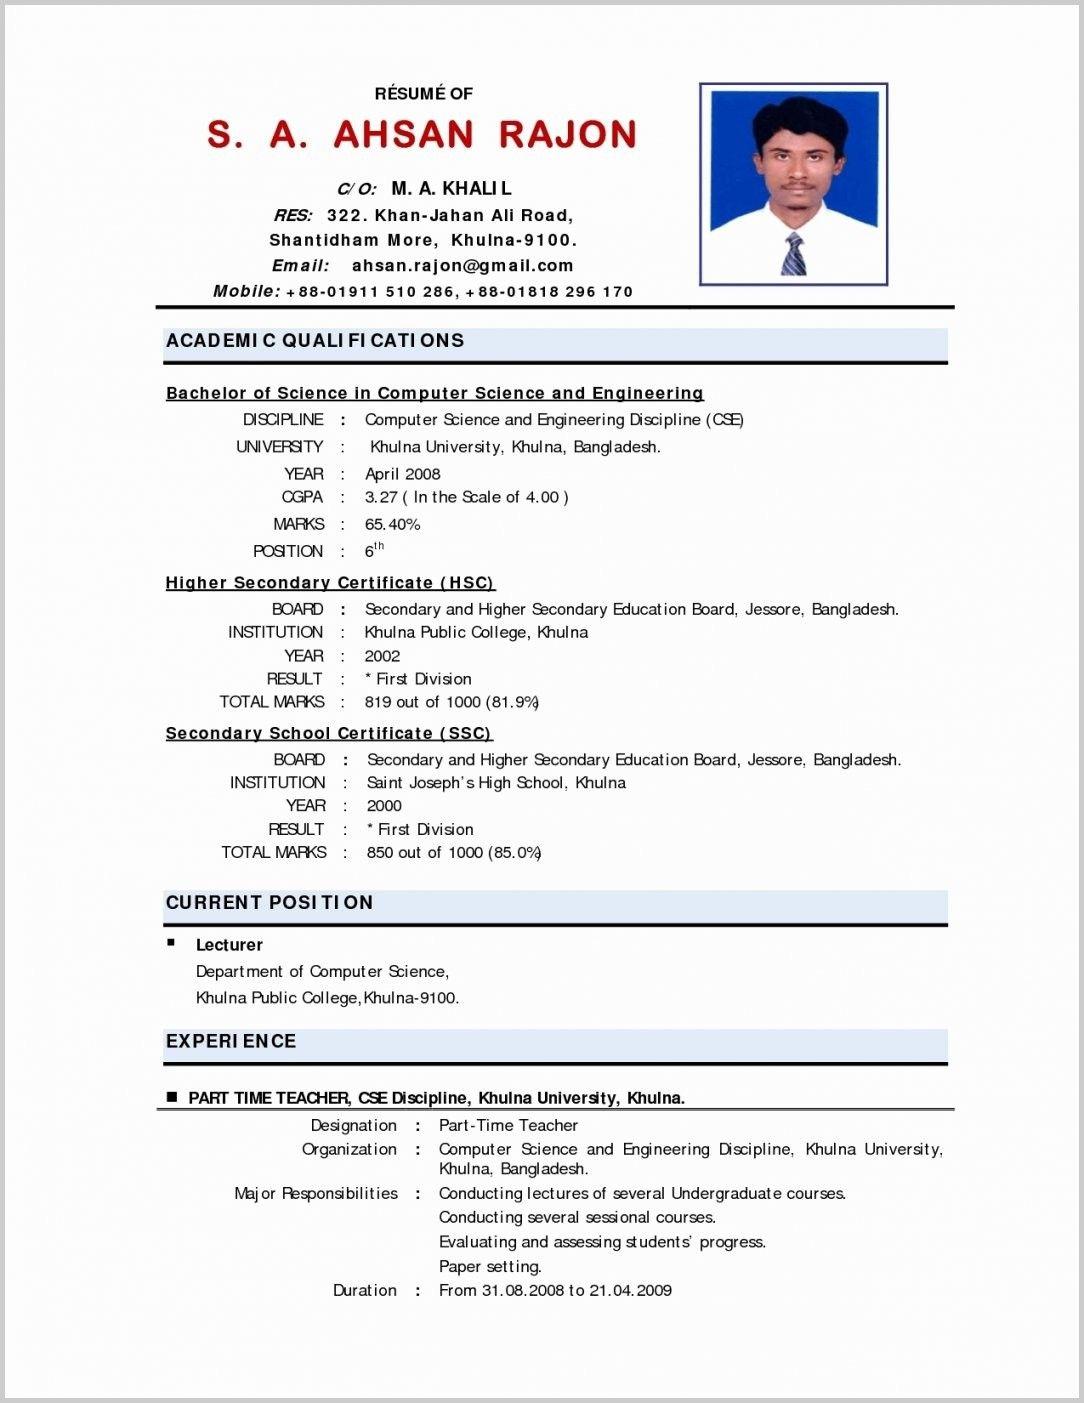 India Resume format download, Best resume format, Resume